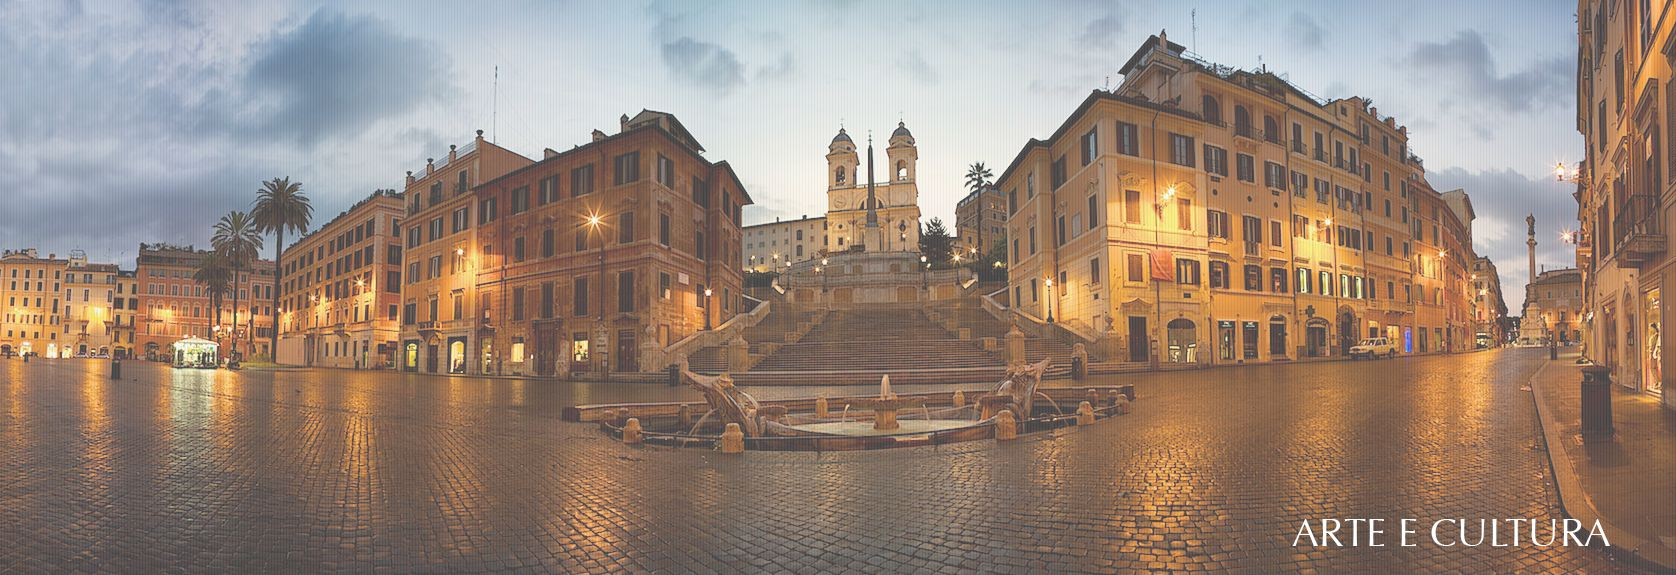 New Piazza Di Spagna